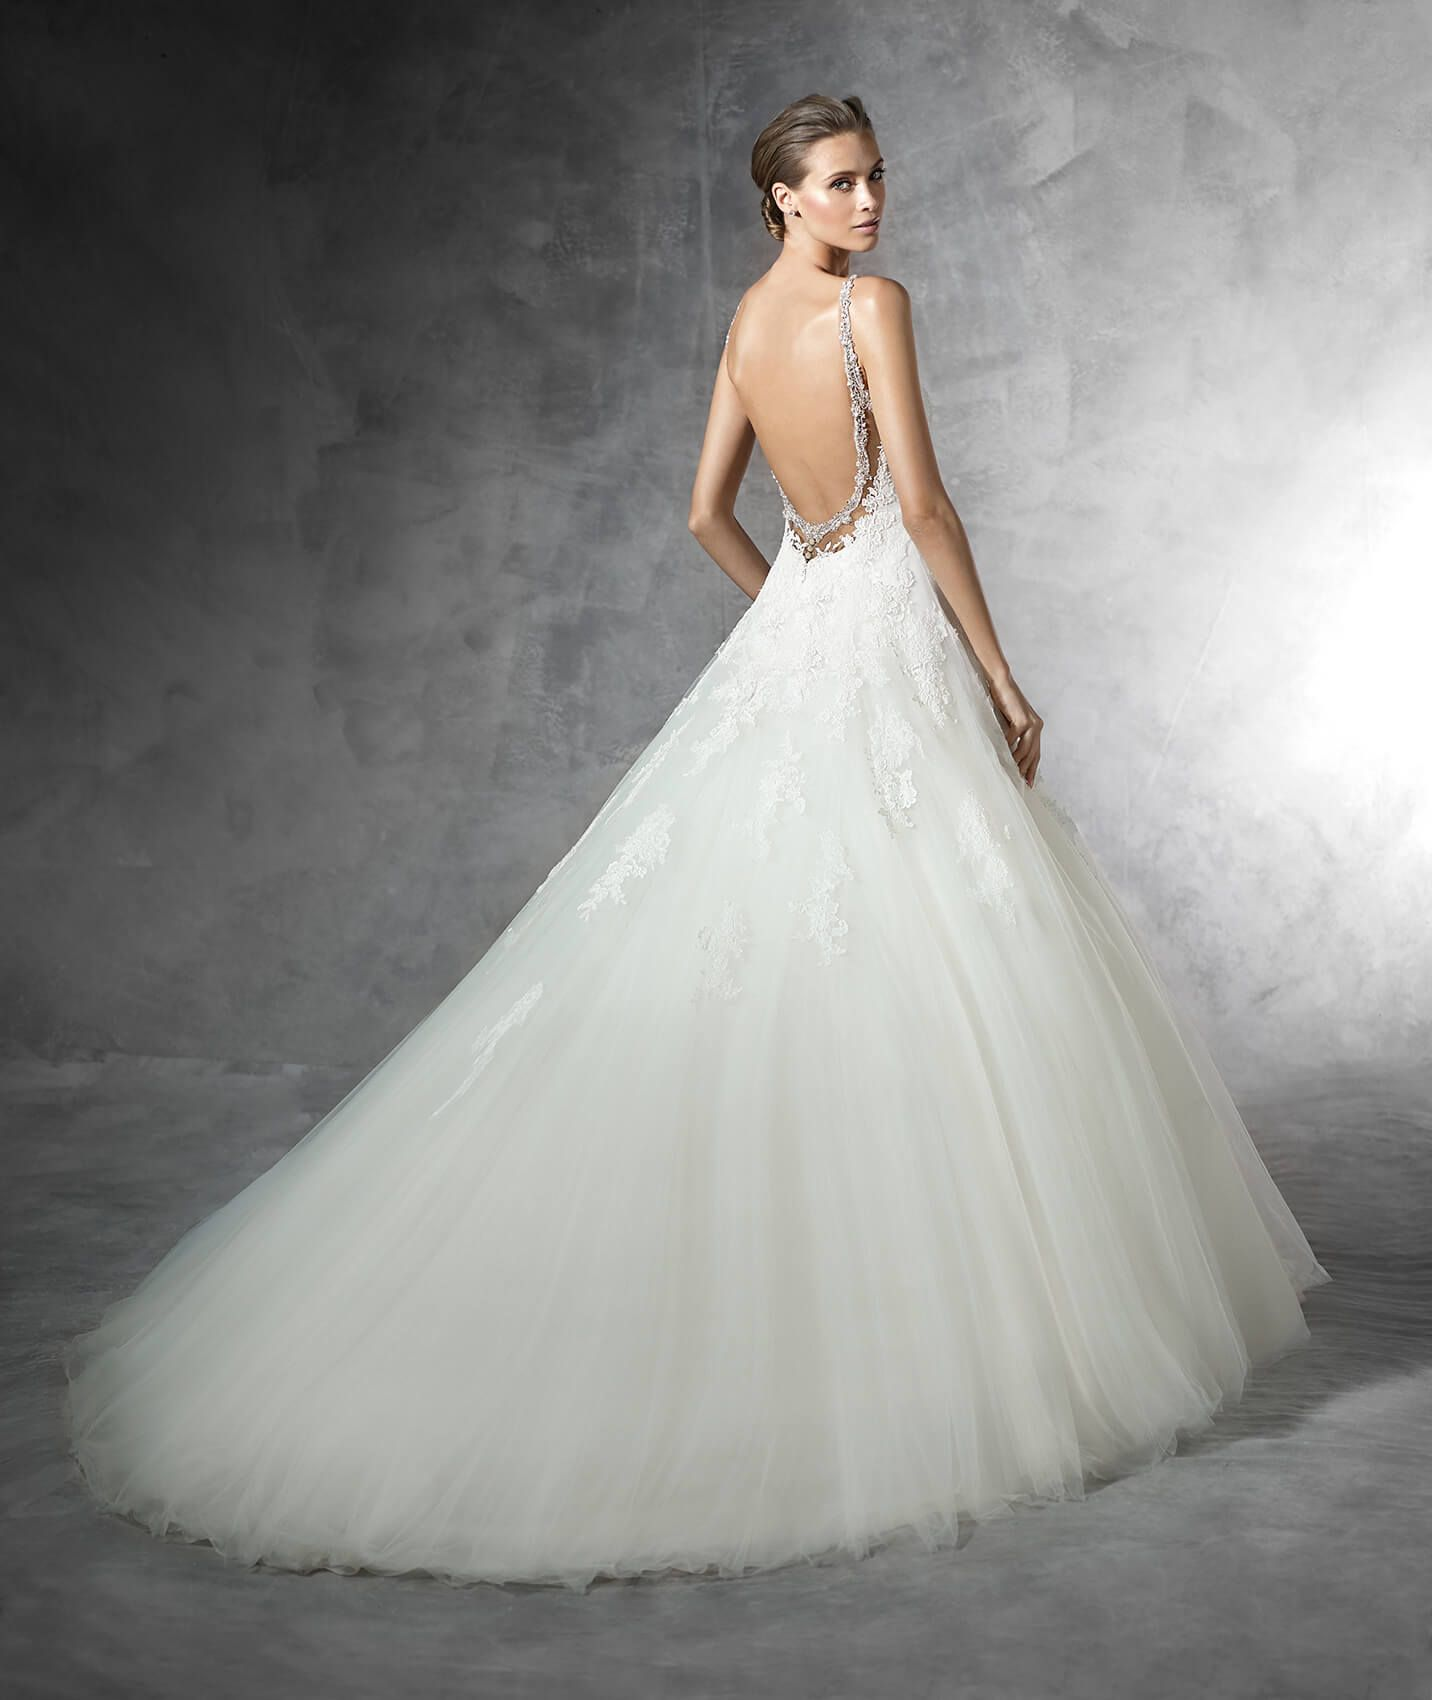 PRALA - Brautkleid aus Tüll im Prinzessin-Stil | Wedding dress and ...